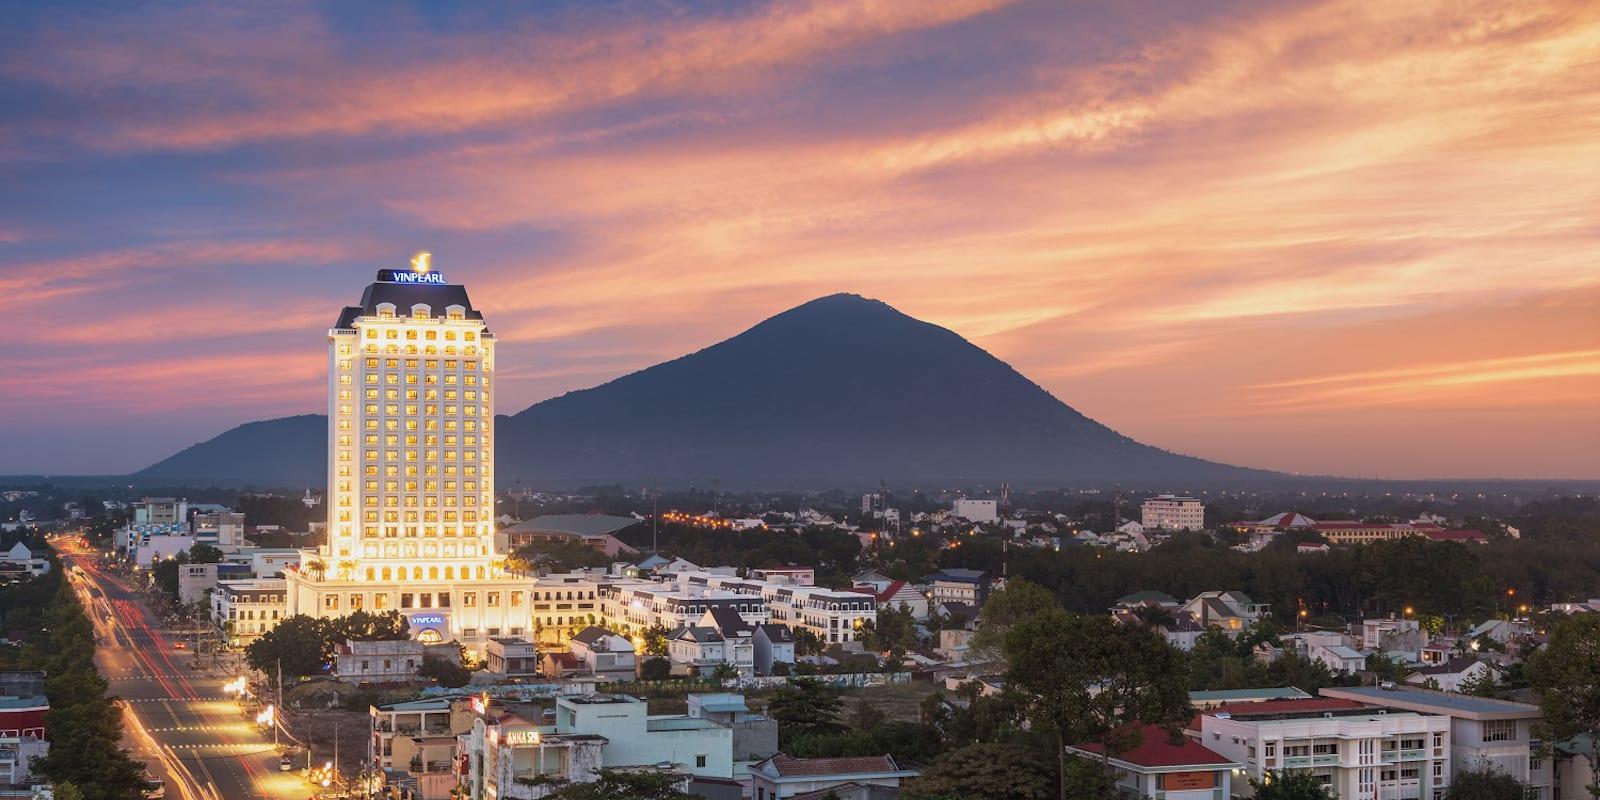 Vinpearl Hotel Tây Ninh 5 Star